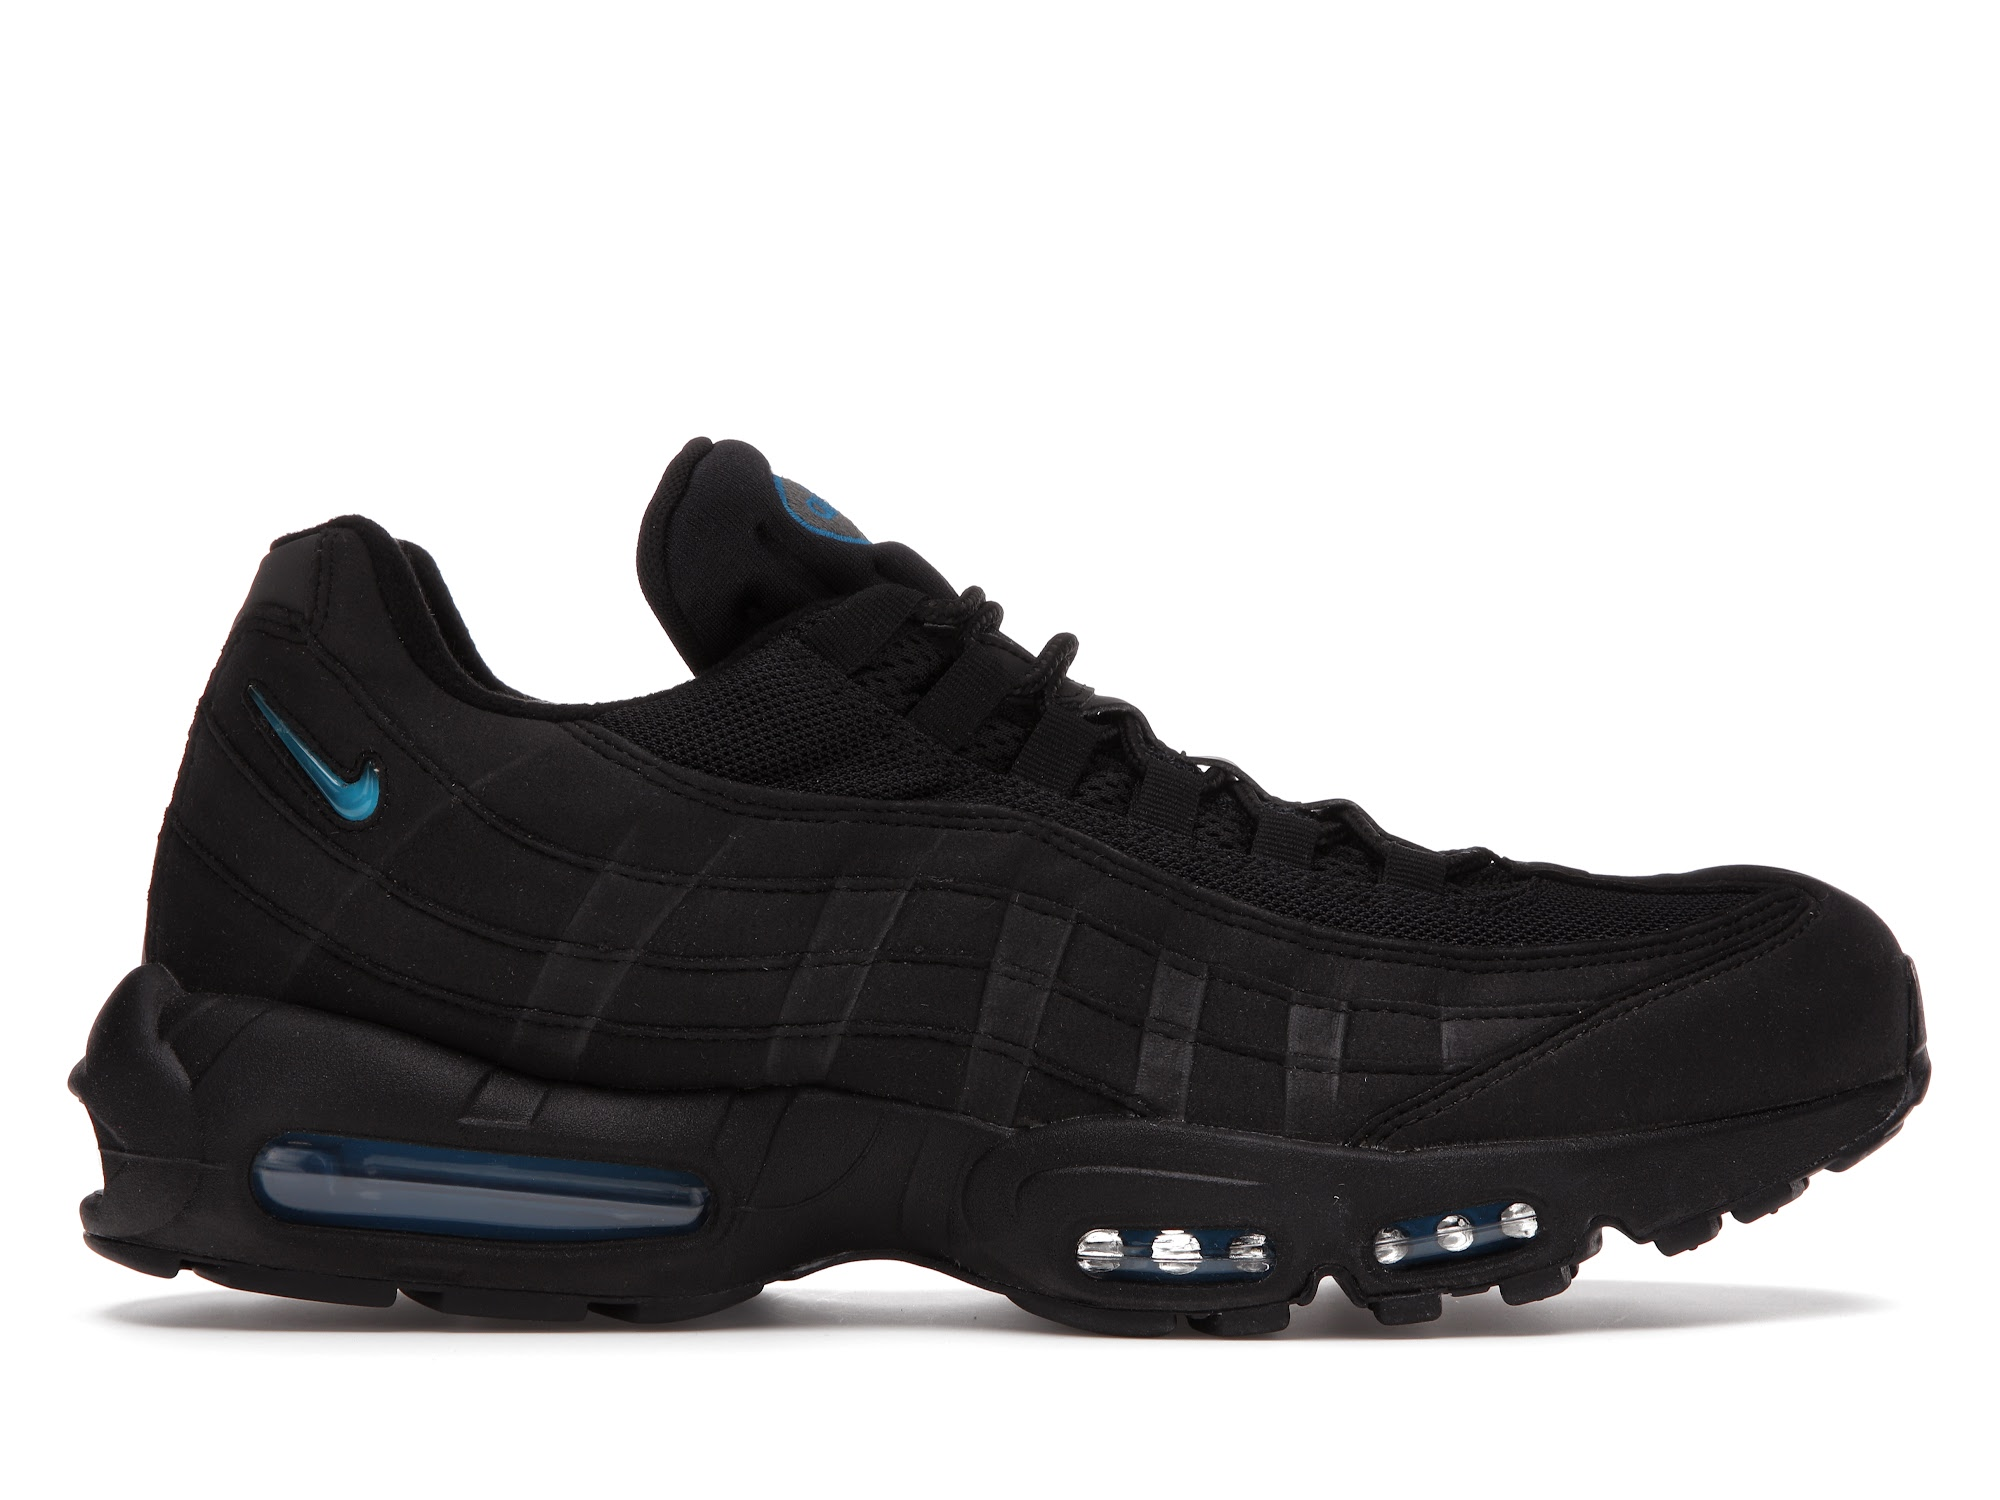 Nike Air Max 95 Black Imperial Blue (atmos Exclusive)